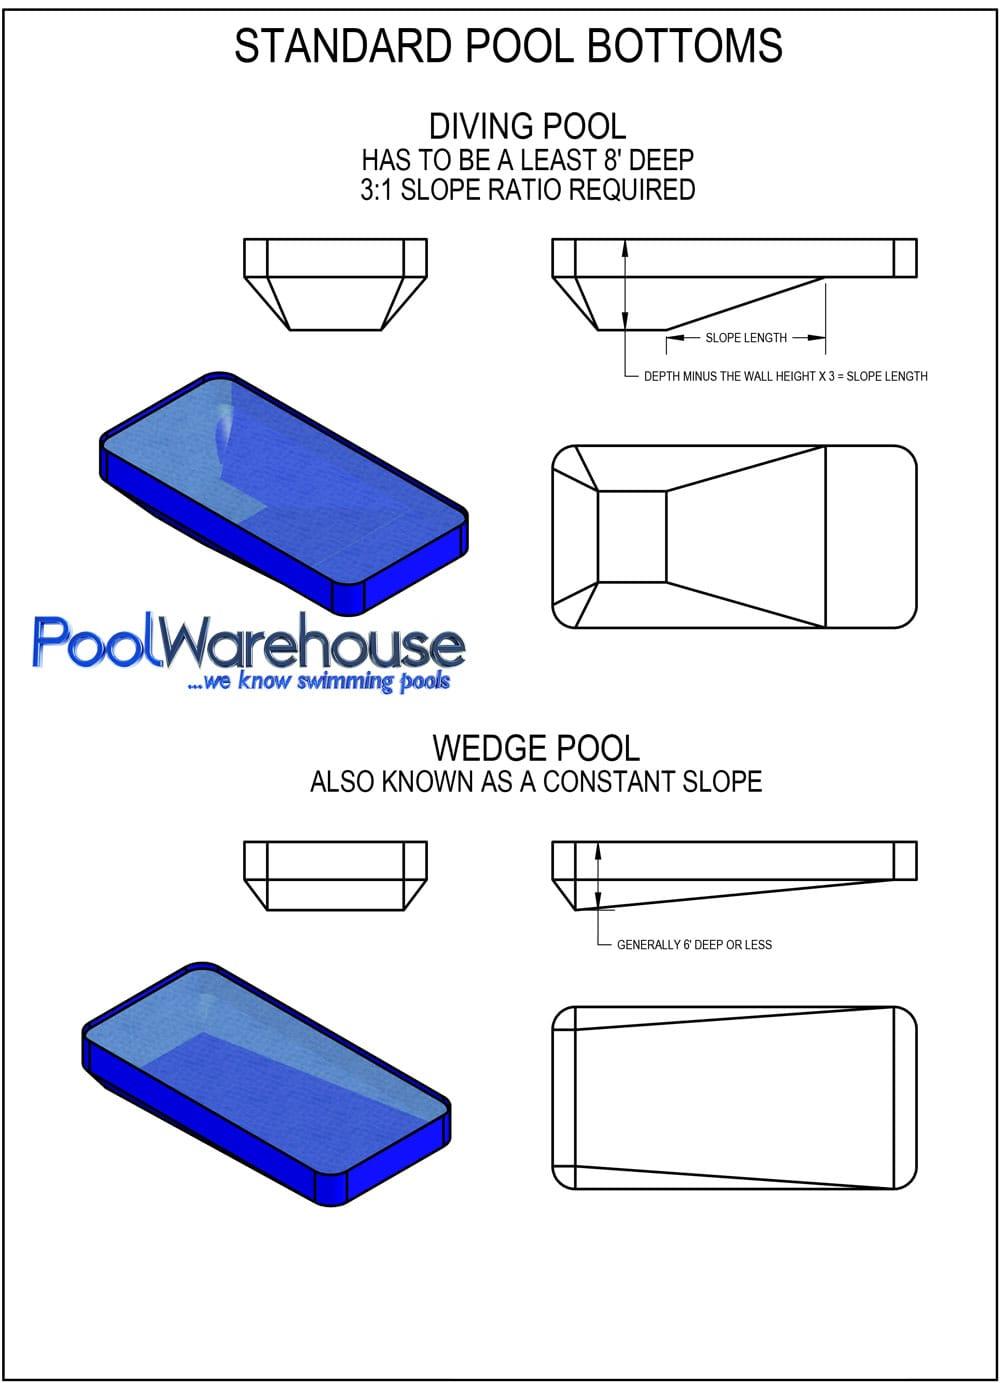 Swimming Pool Kit Bottom Styles - Pool Warehouse